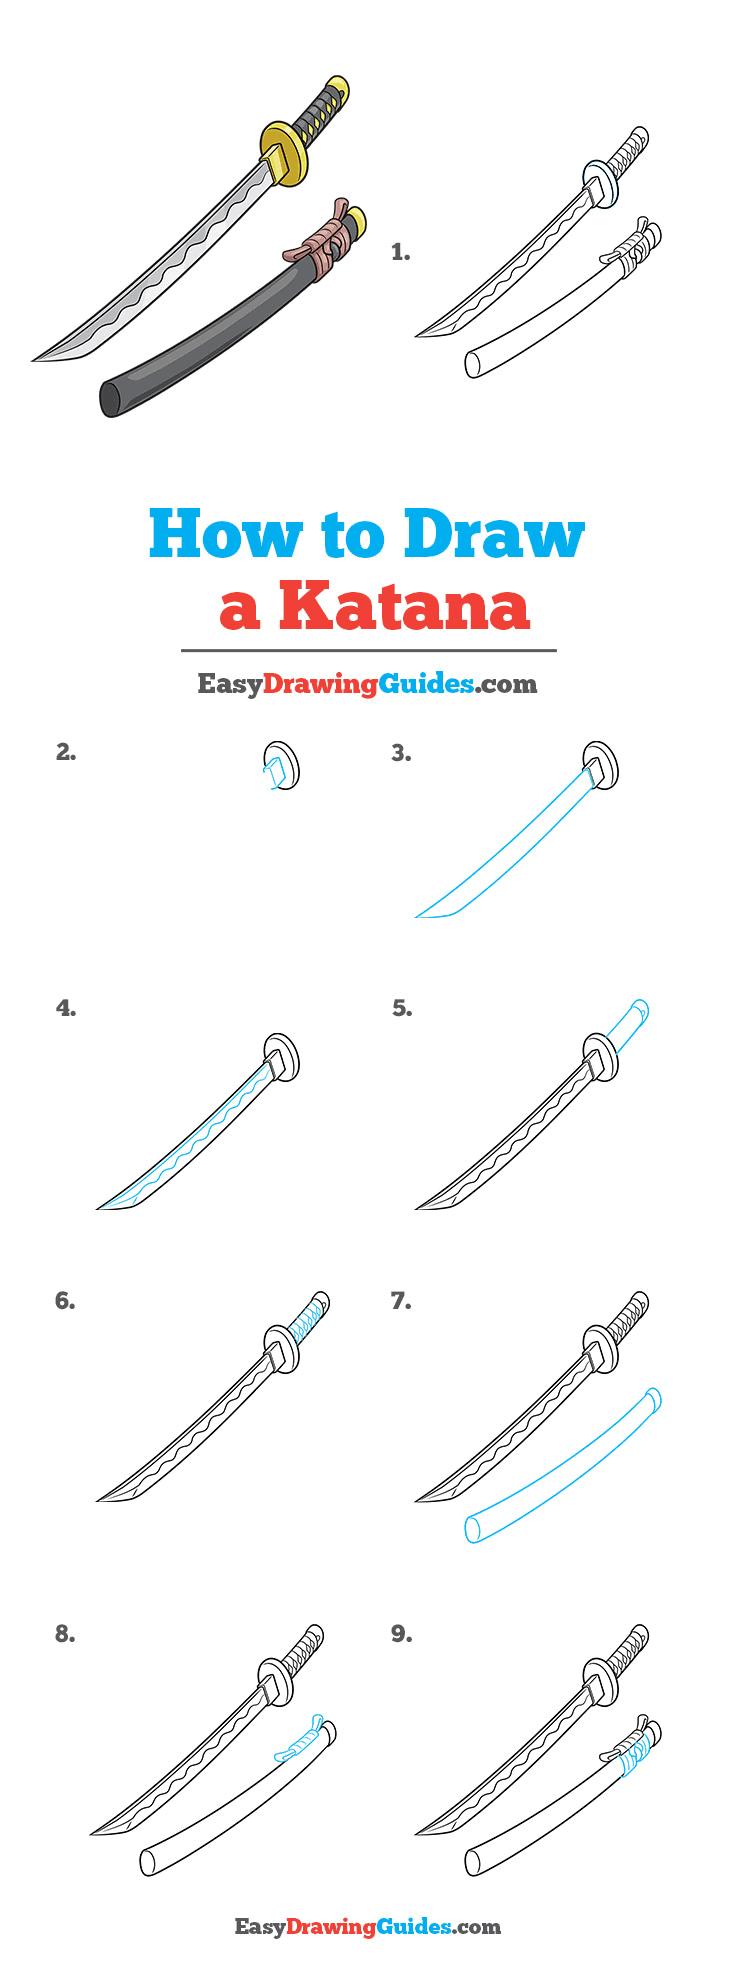 How to Draw Katana